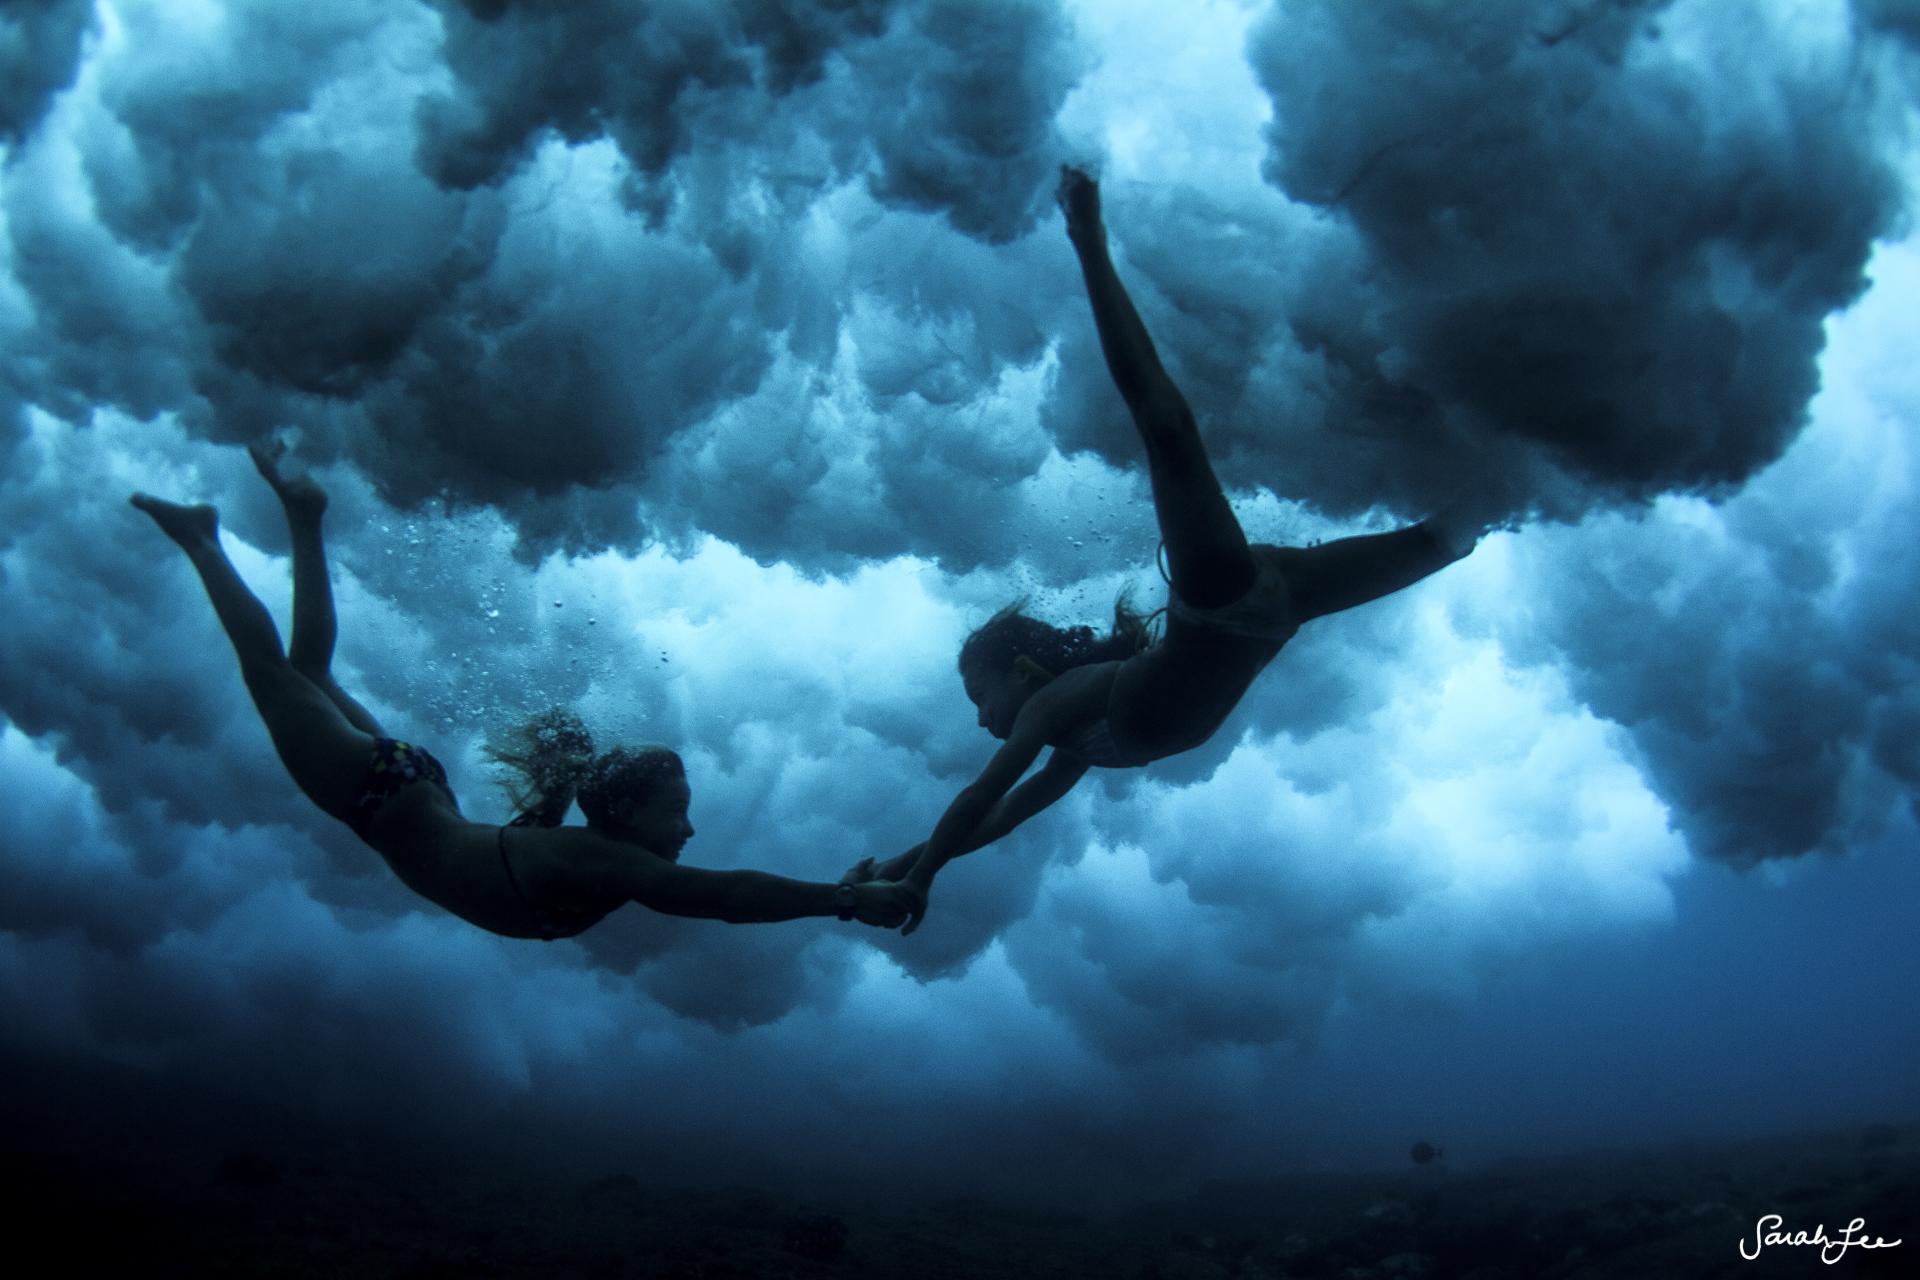 023_Sarah_Lee_Photography_Underwater_1987.jpg